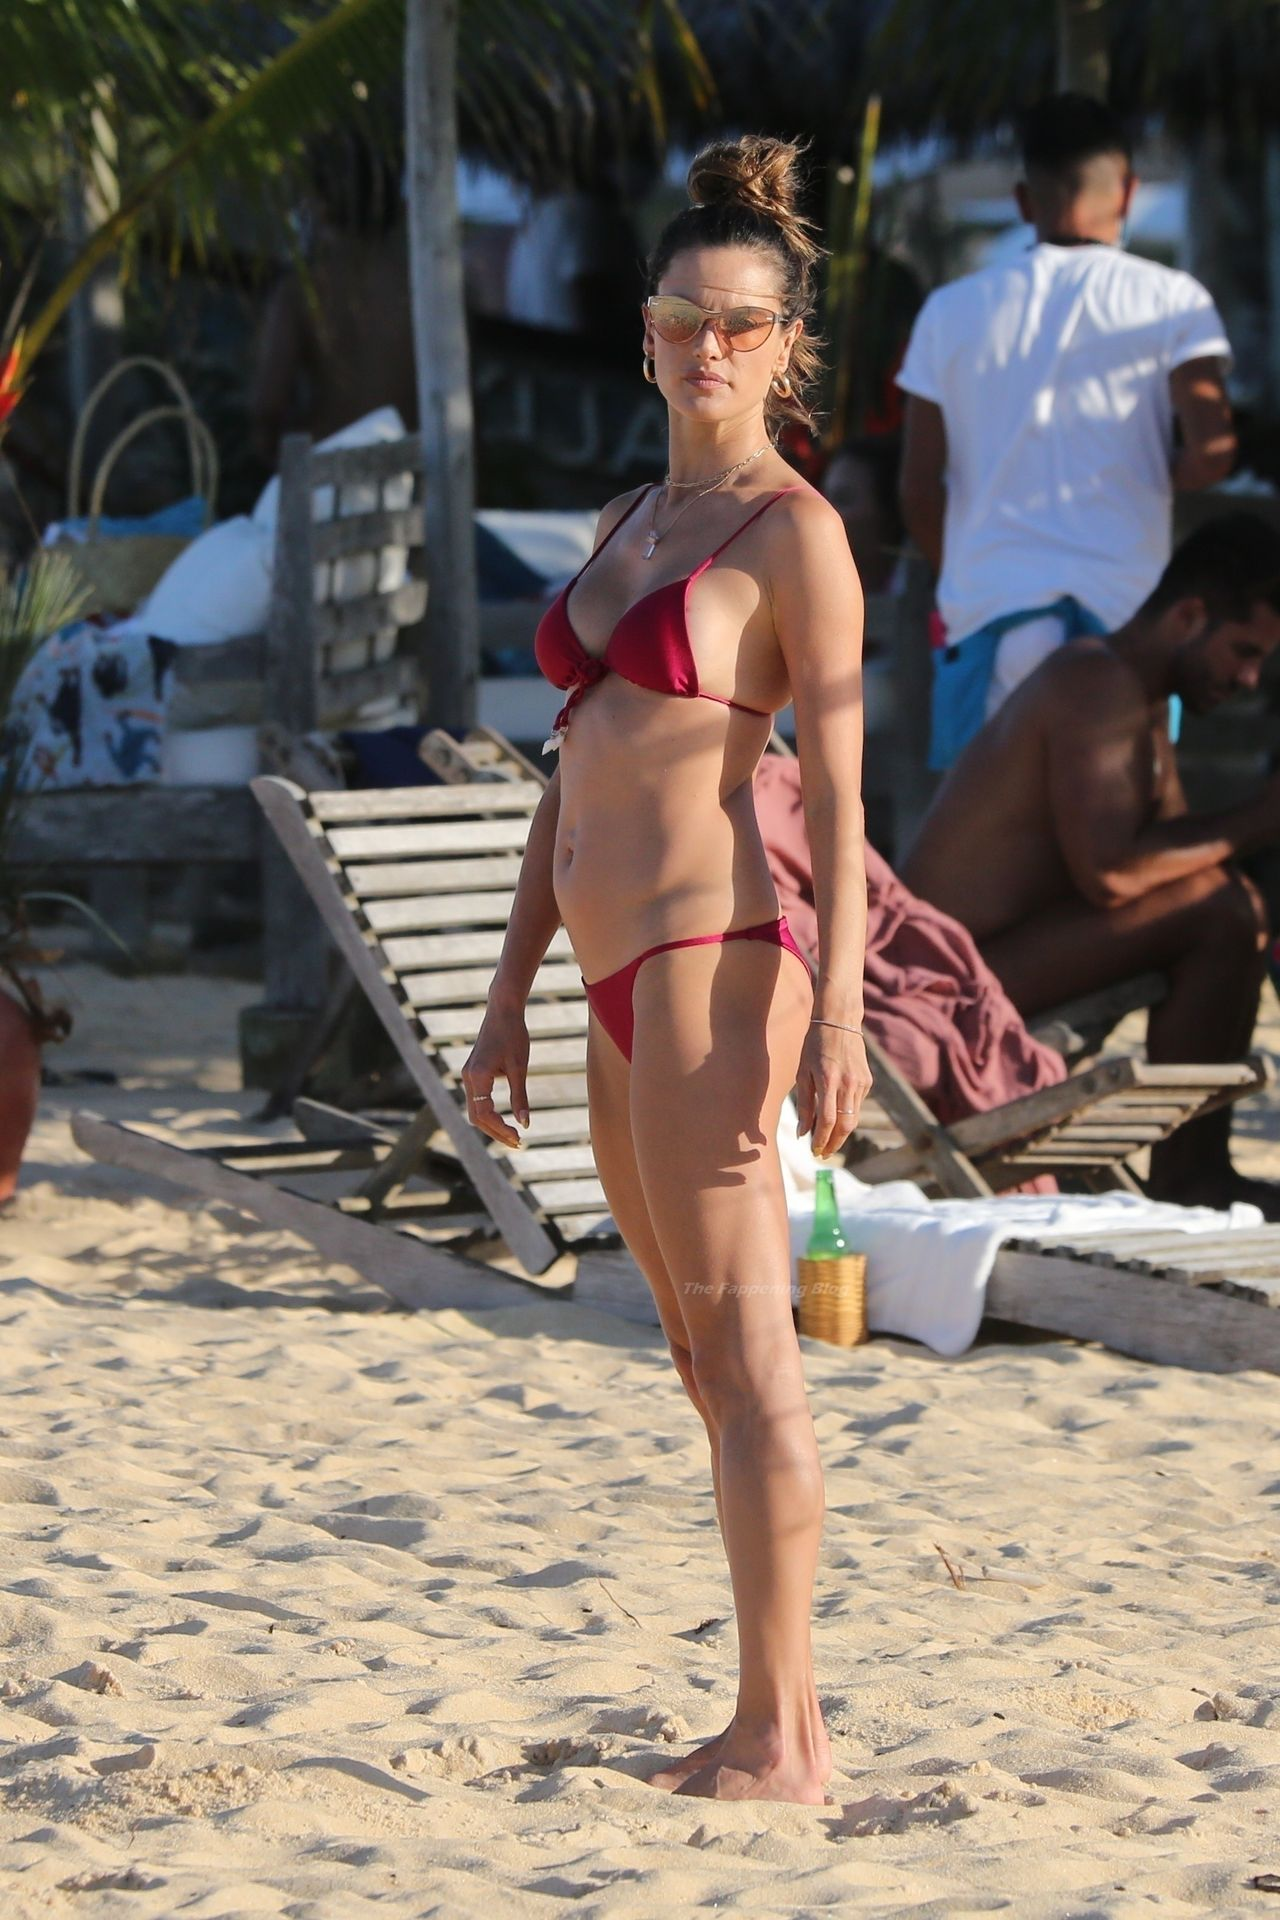 Alessandra-Ambrosio-Sexy-5-thefappeningblog.com_-1.jpg